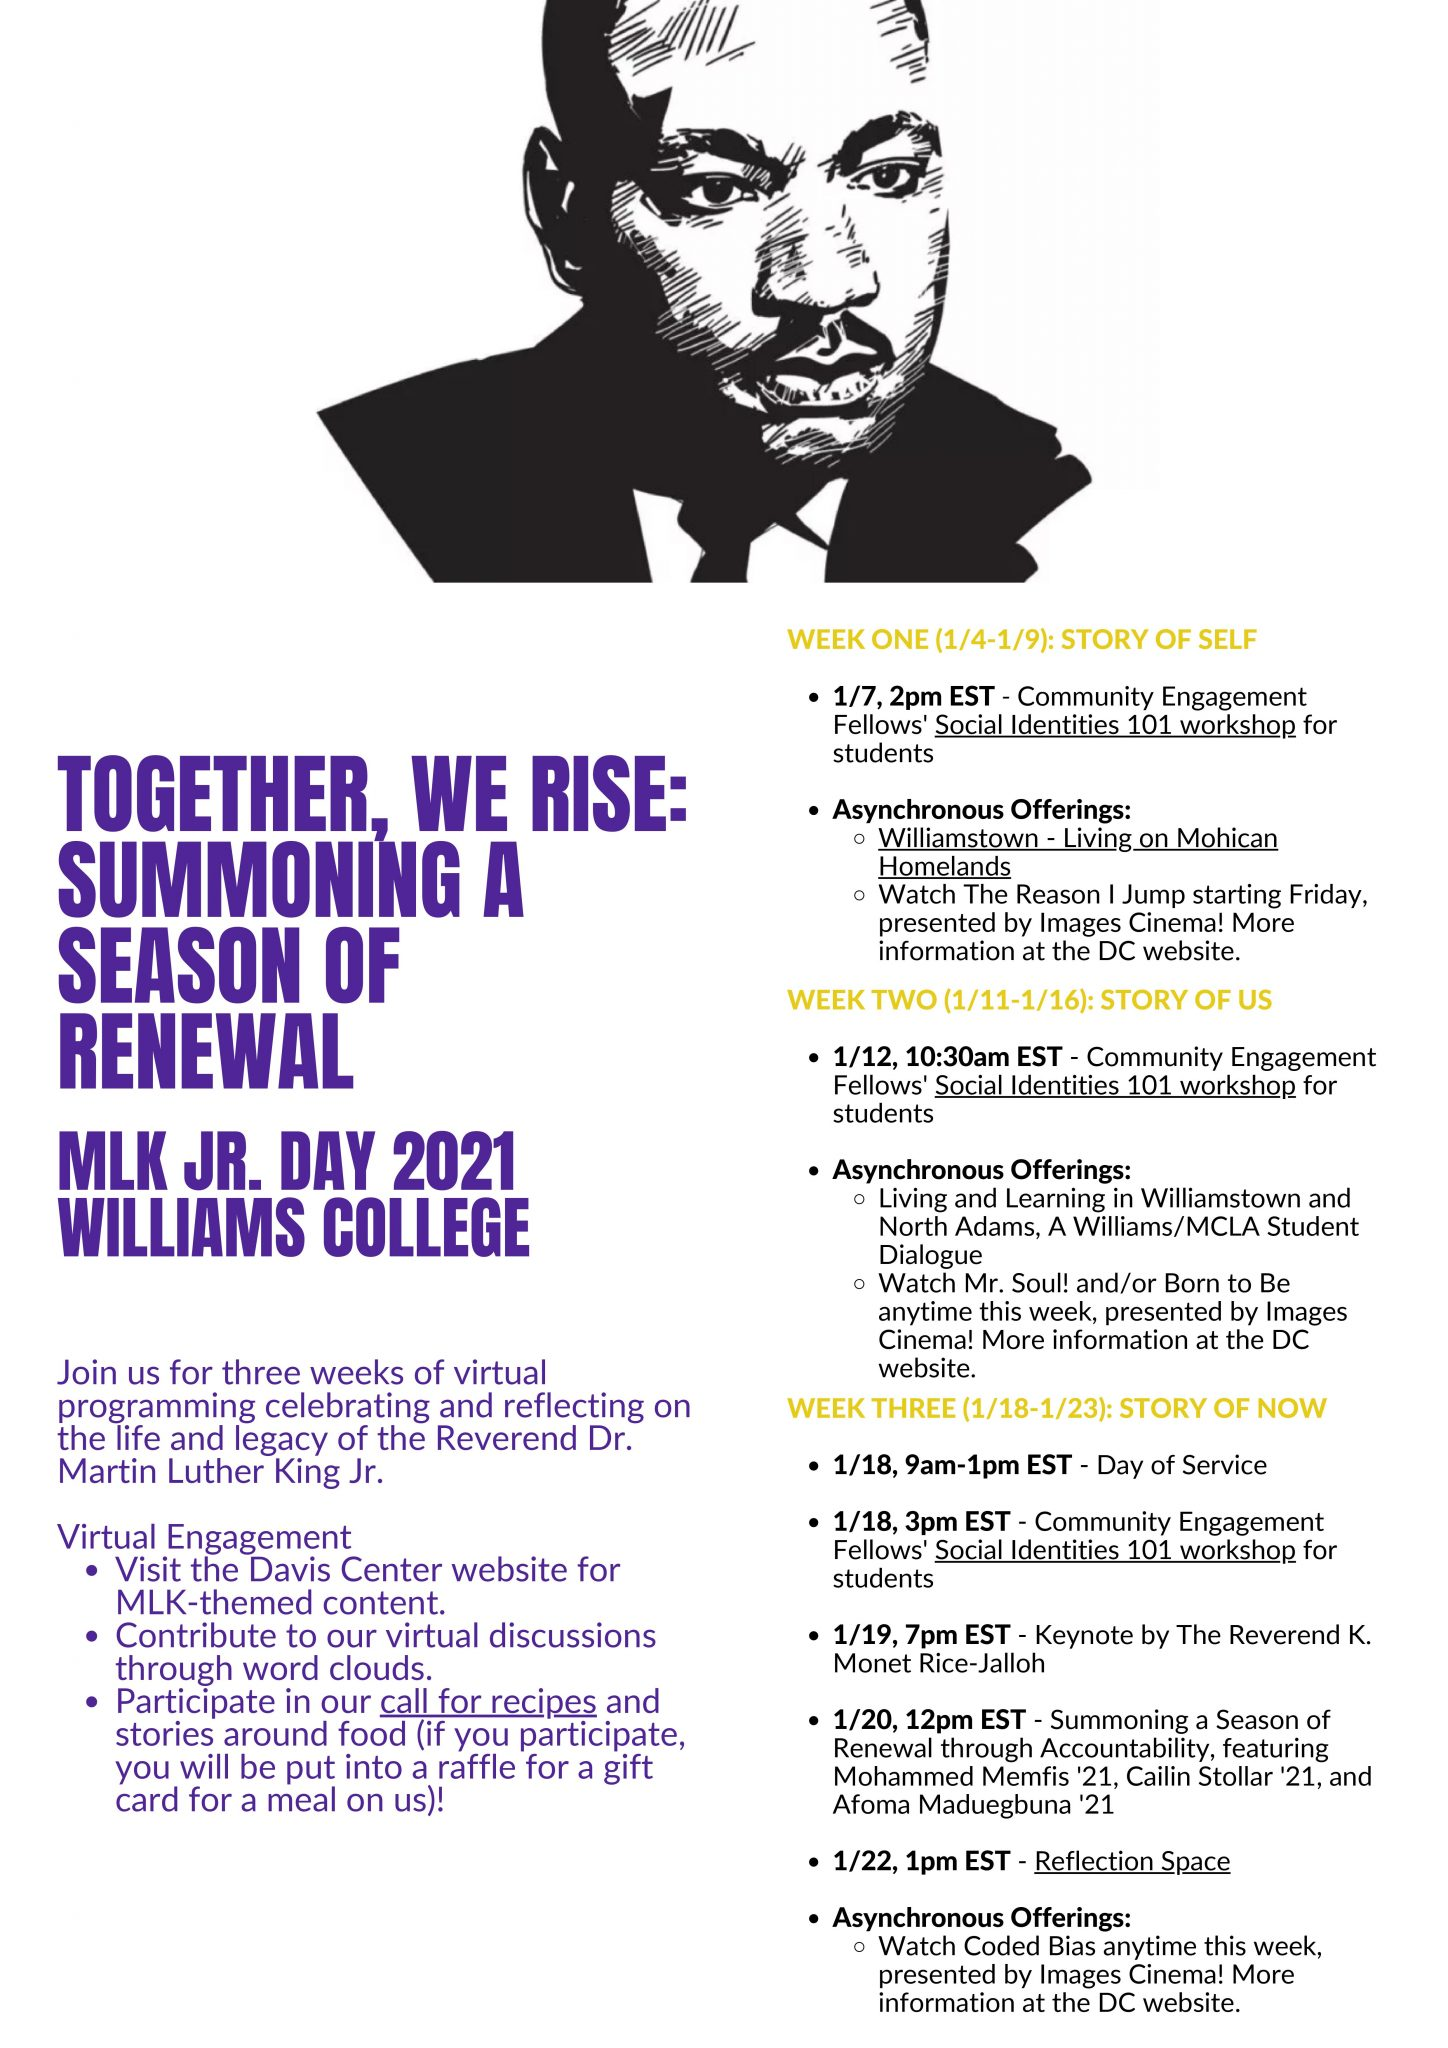 MLK Jr. Day Event Poster